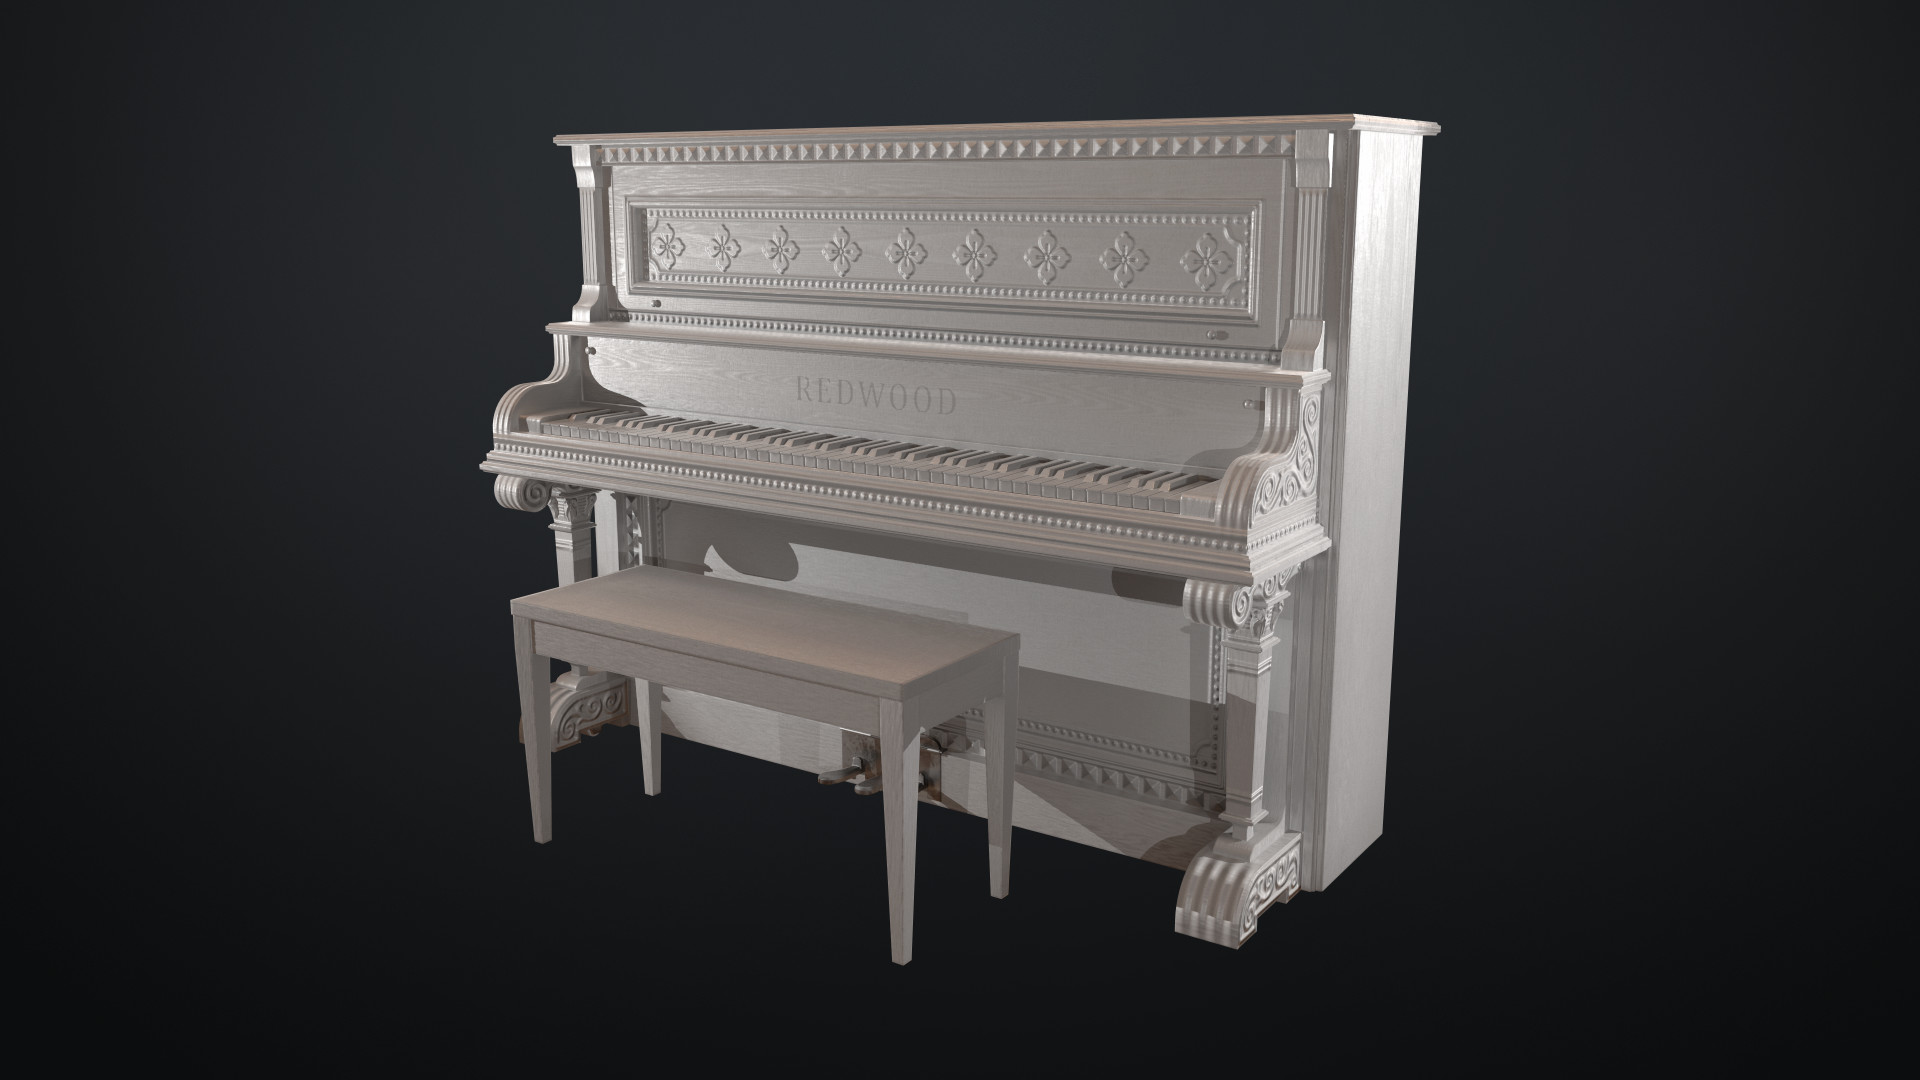 Sami tarvainen piano render 5